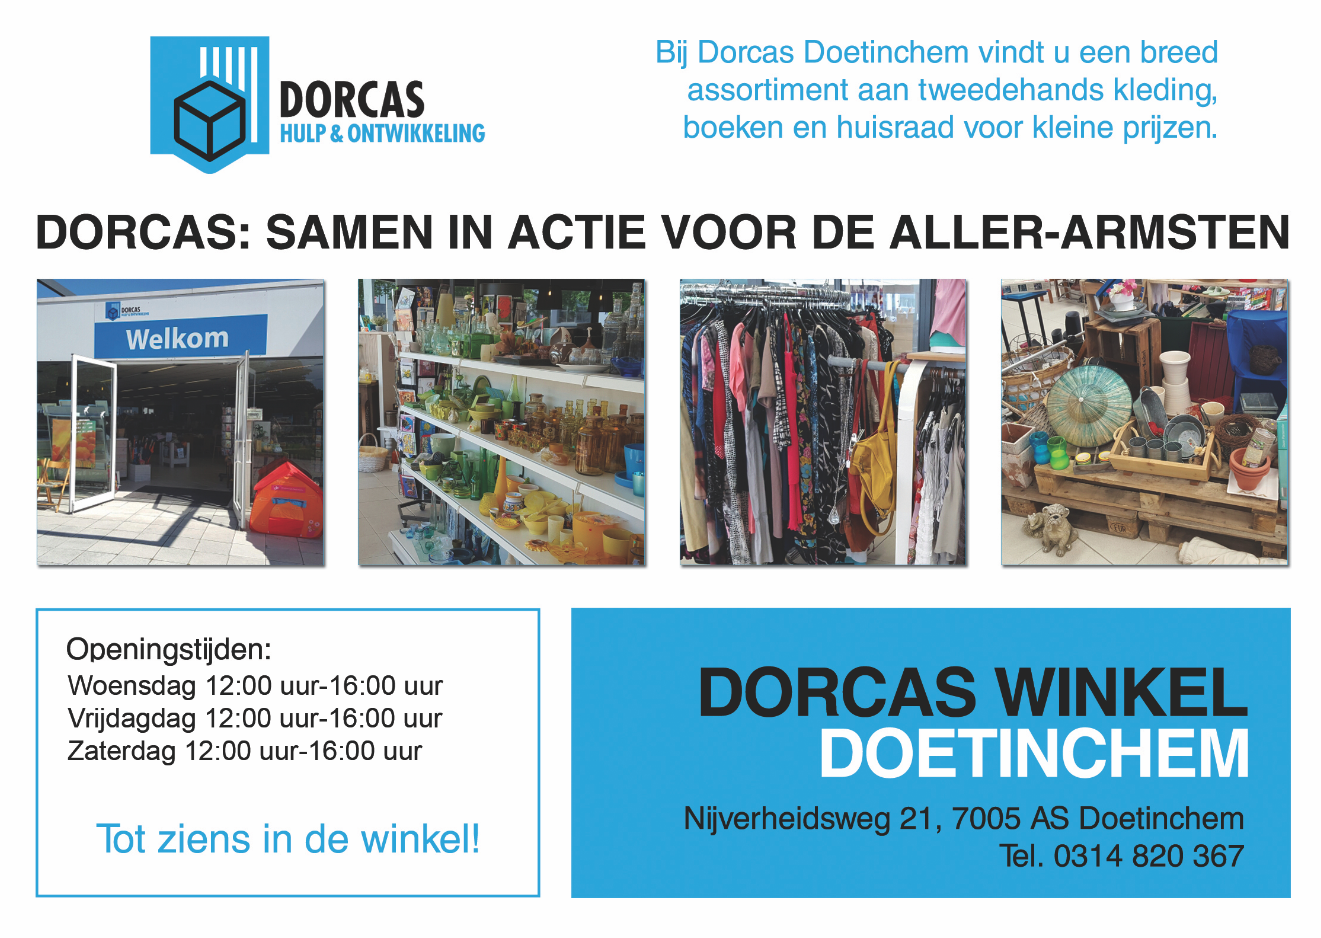 Dorcas Doetinchem